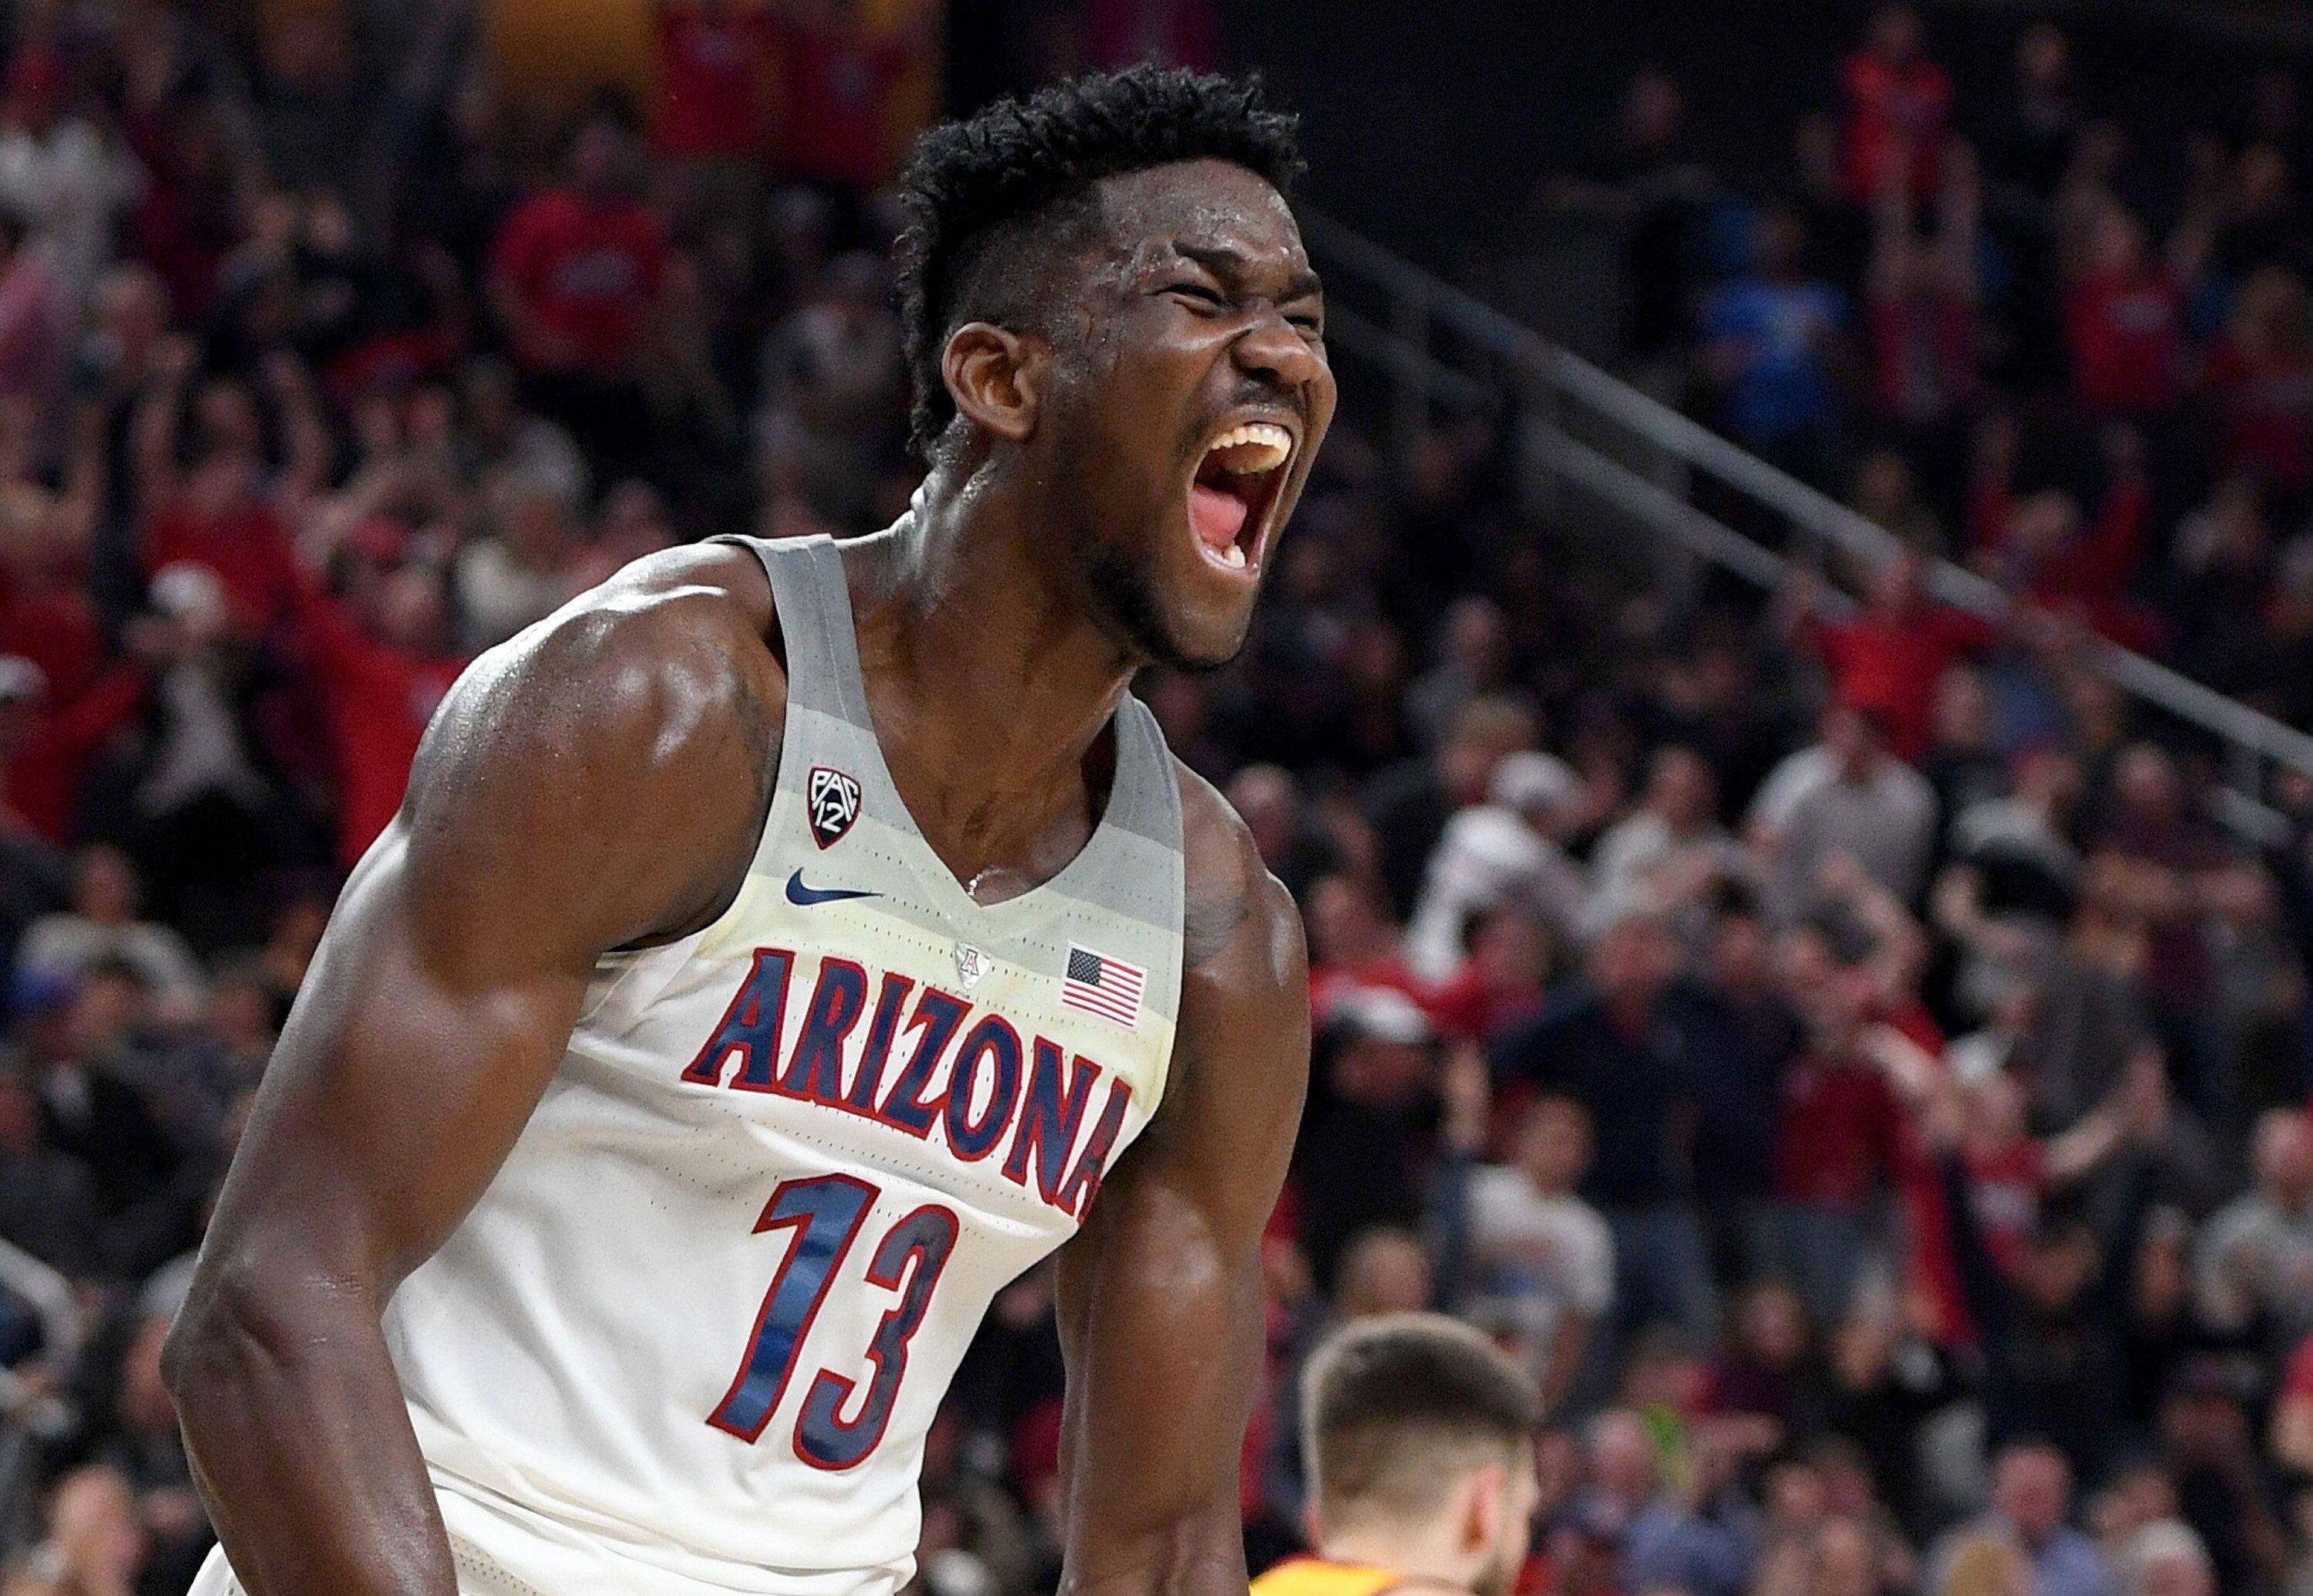 1e4c9275cf0ff2 Arizona Basketball  Top 5 Wildcat Freshmen of All-Time